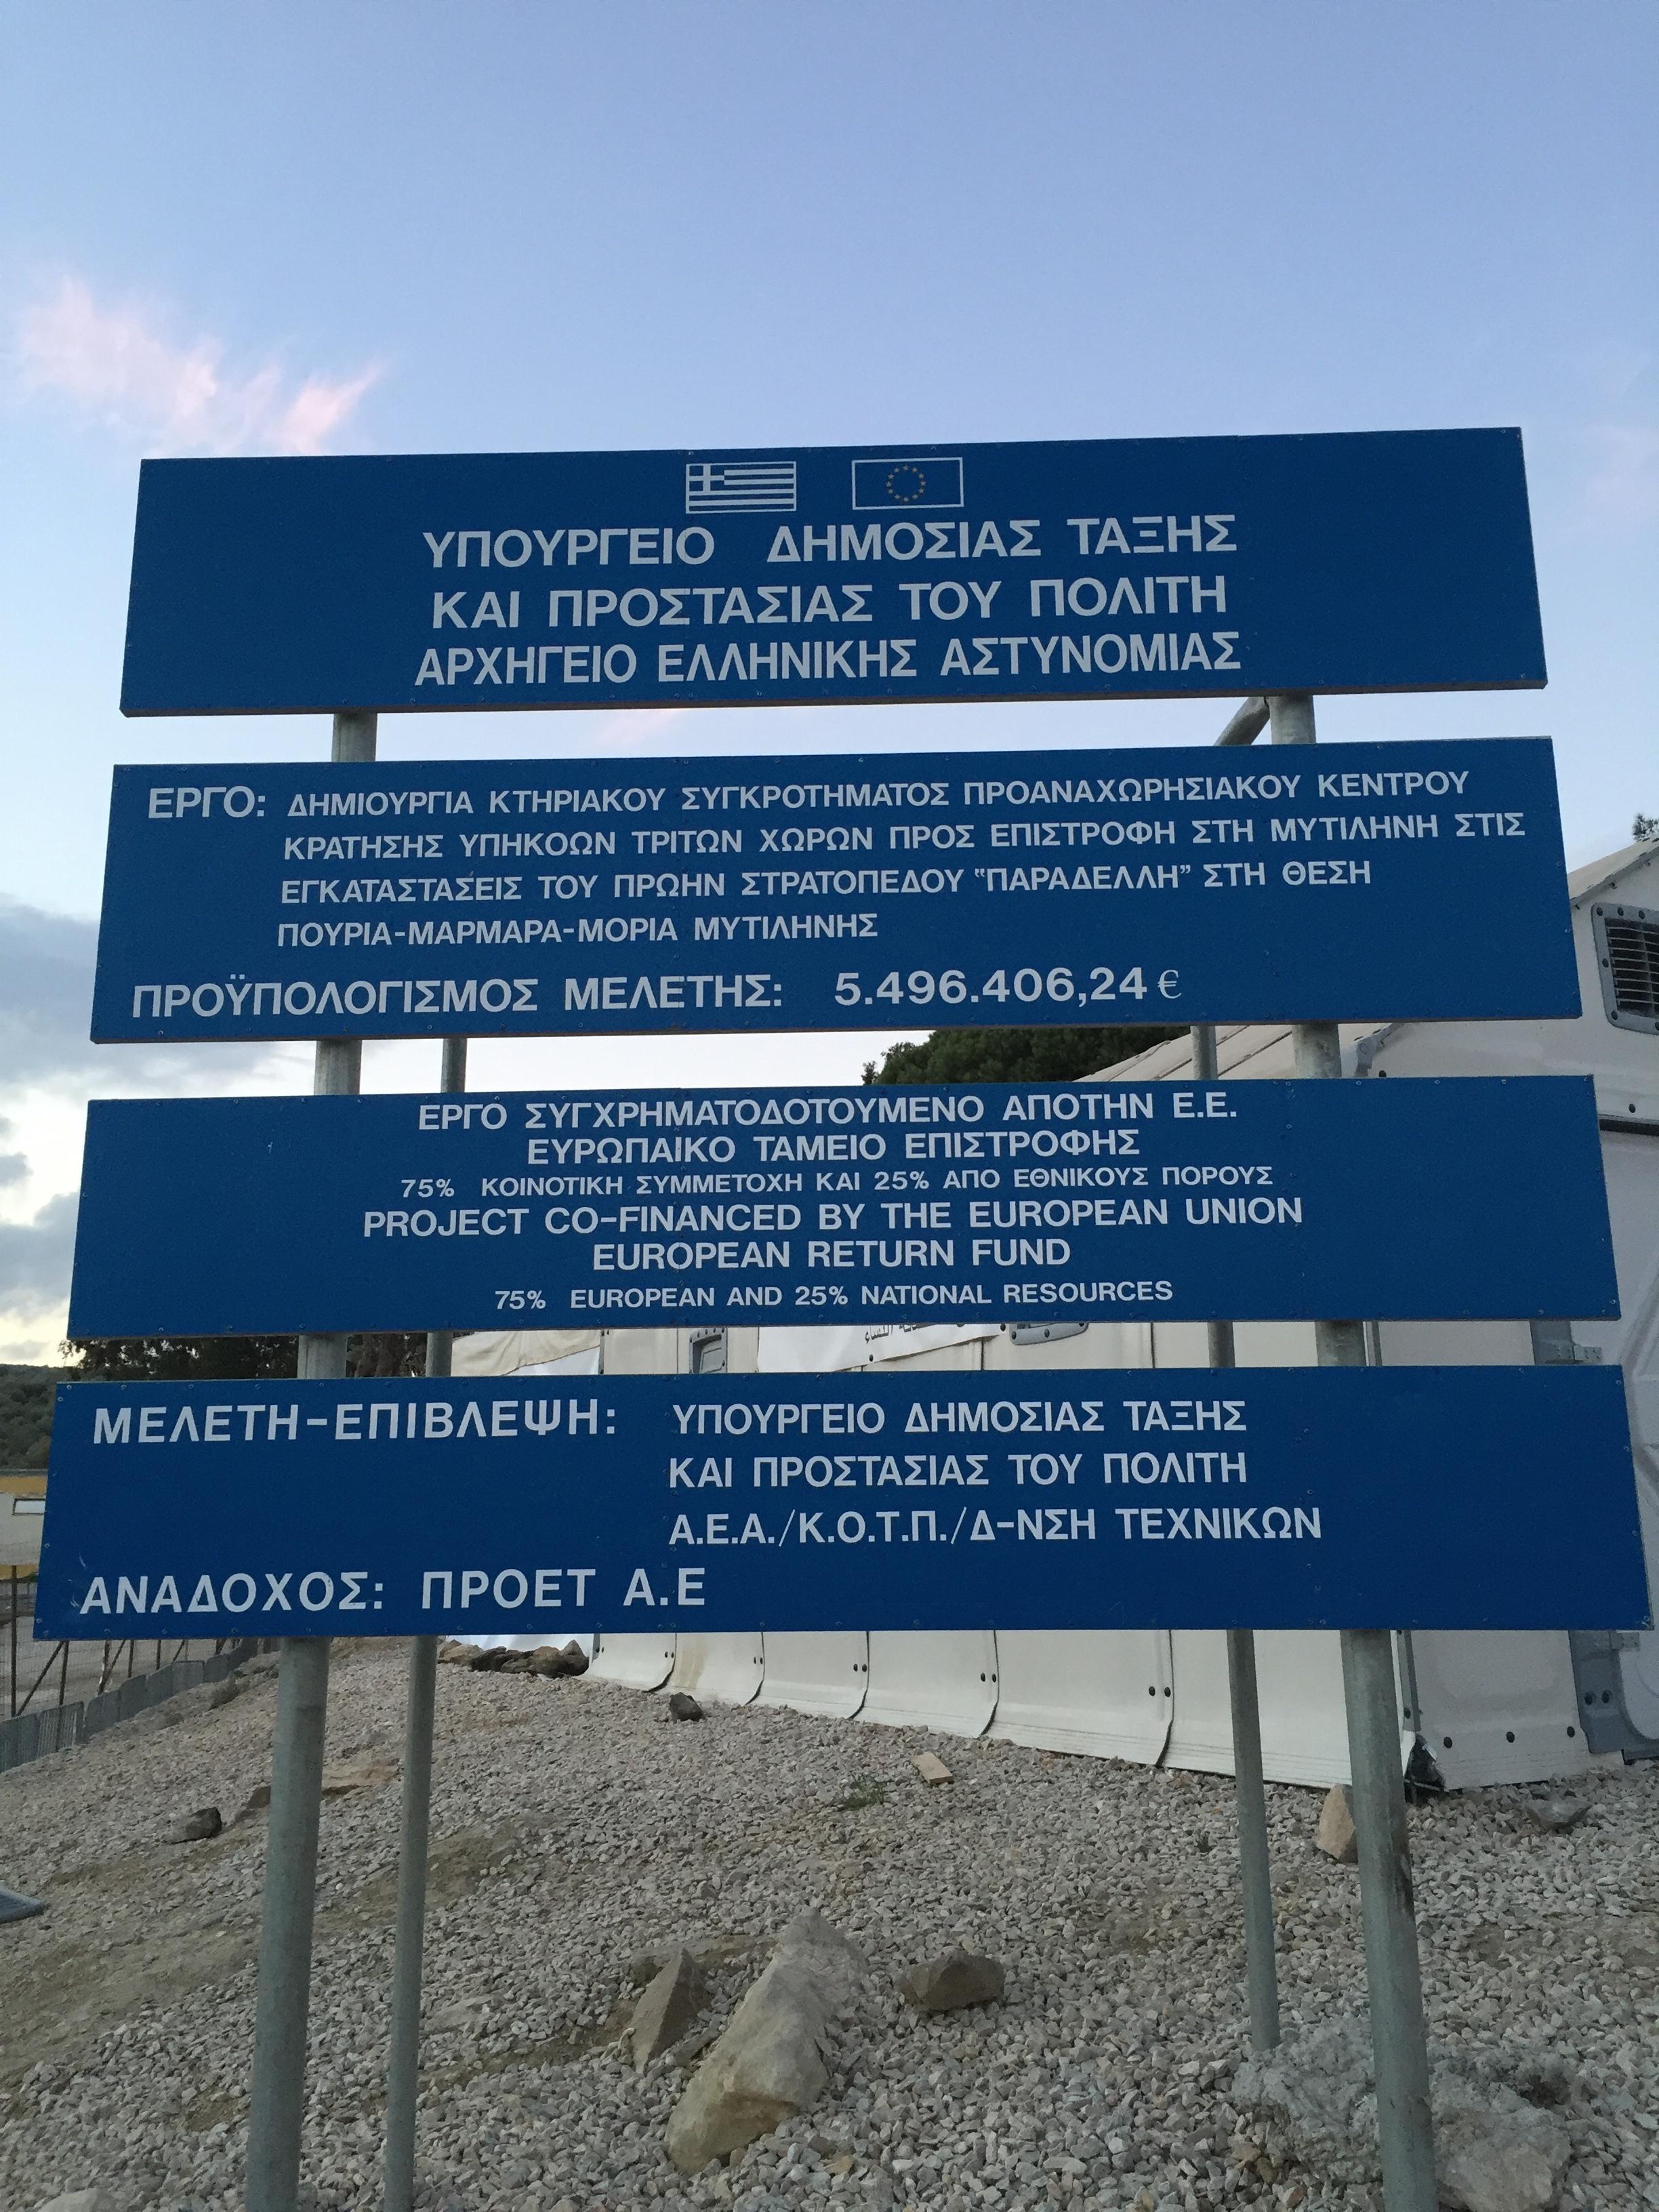 eu-funding-board-moria-pallister-wilkins